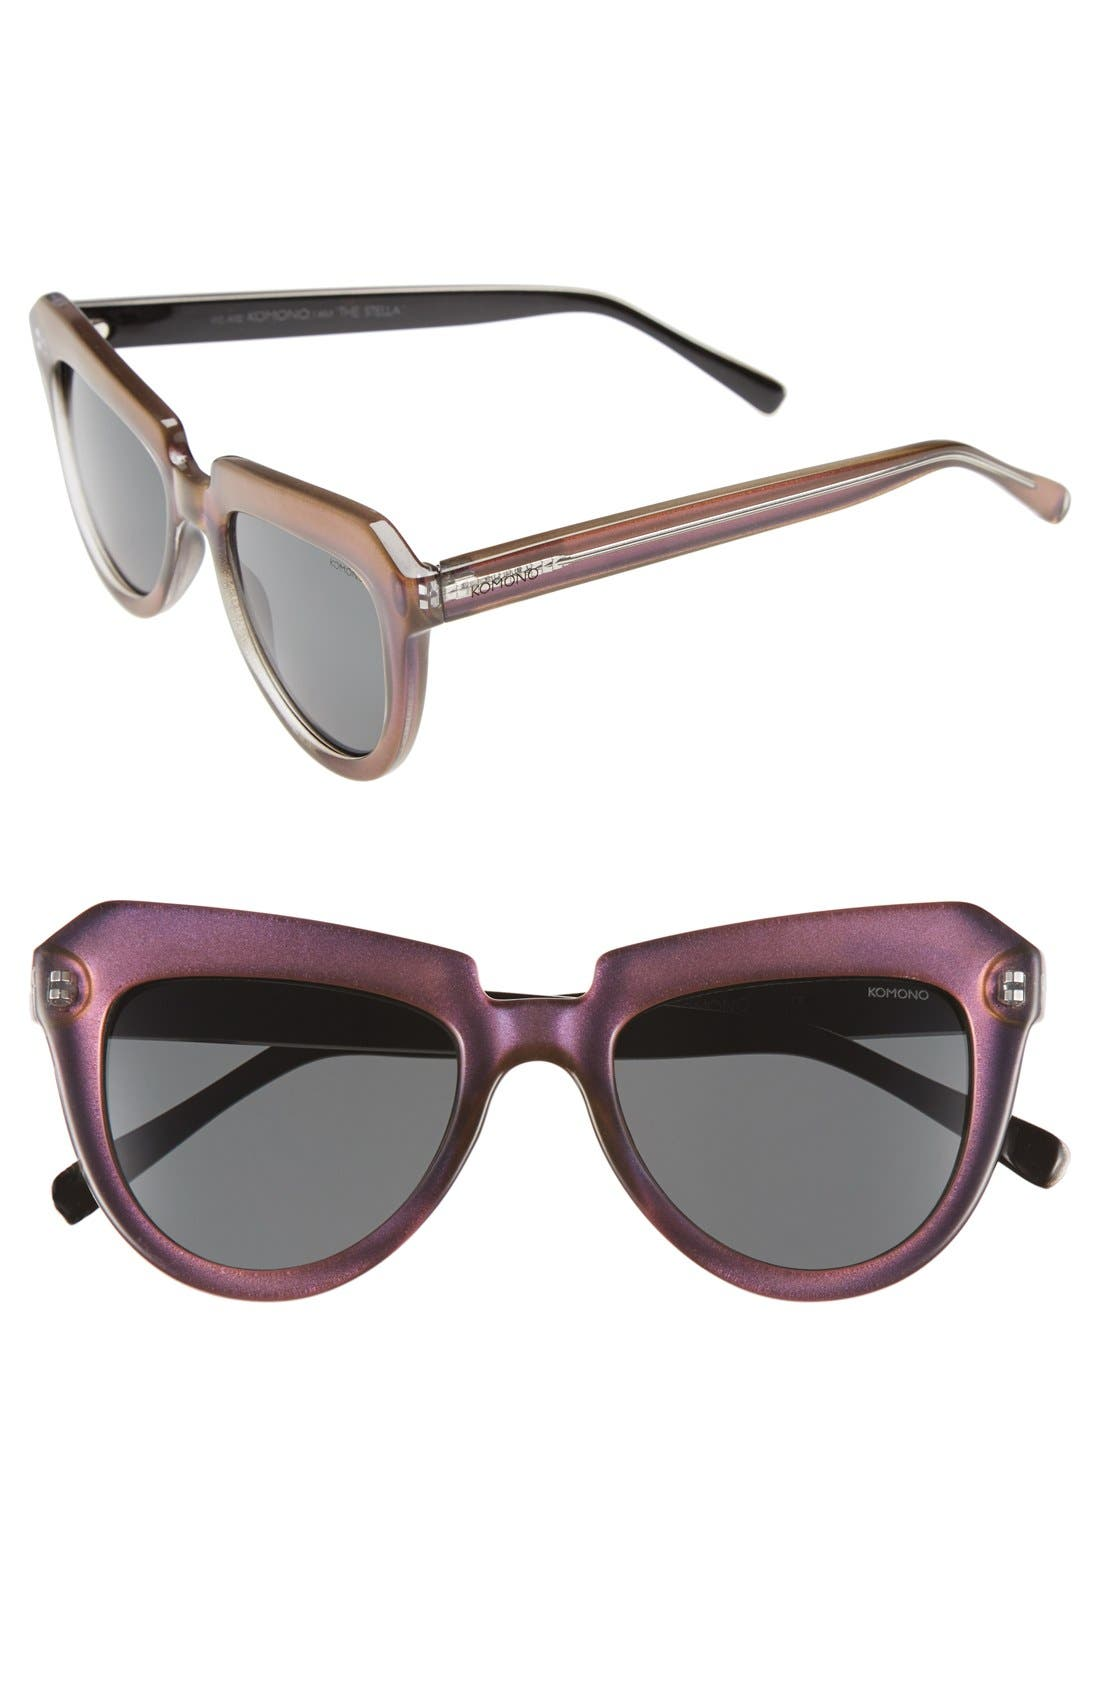 Alternate Image 1 Selected - Komono 'Stella' Sunglasses